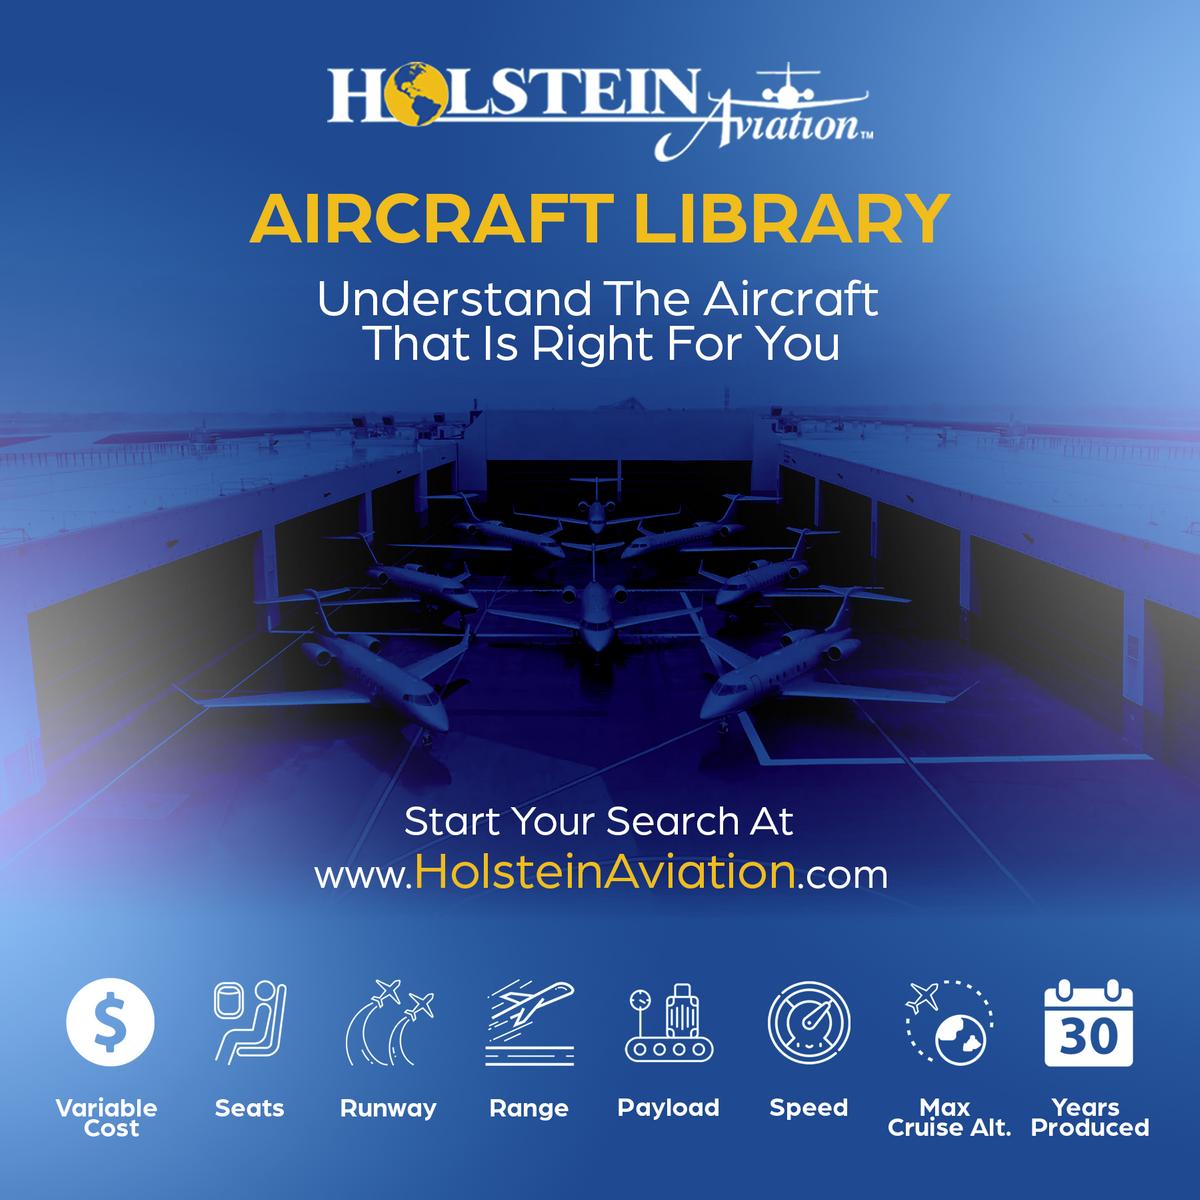 aircraft-library-4.png